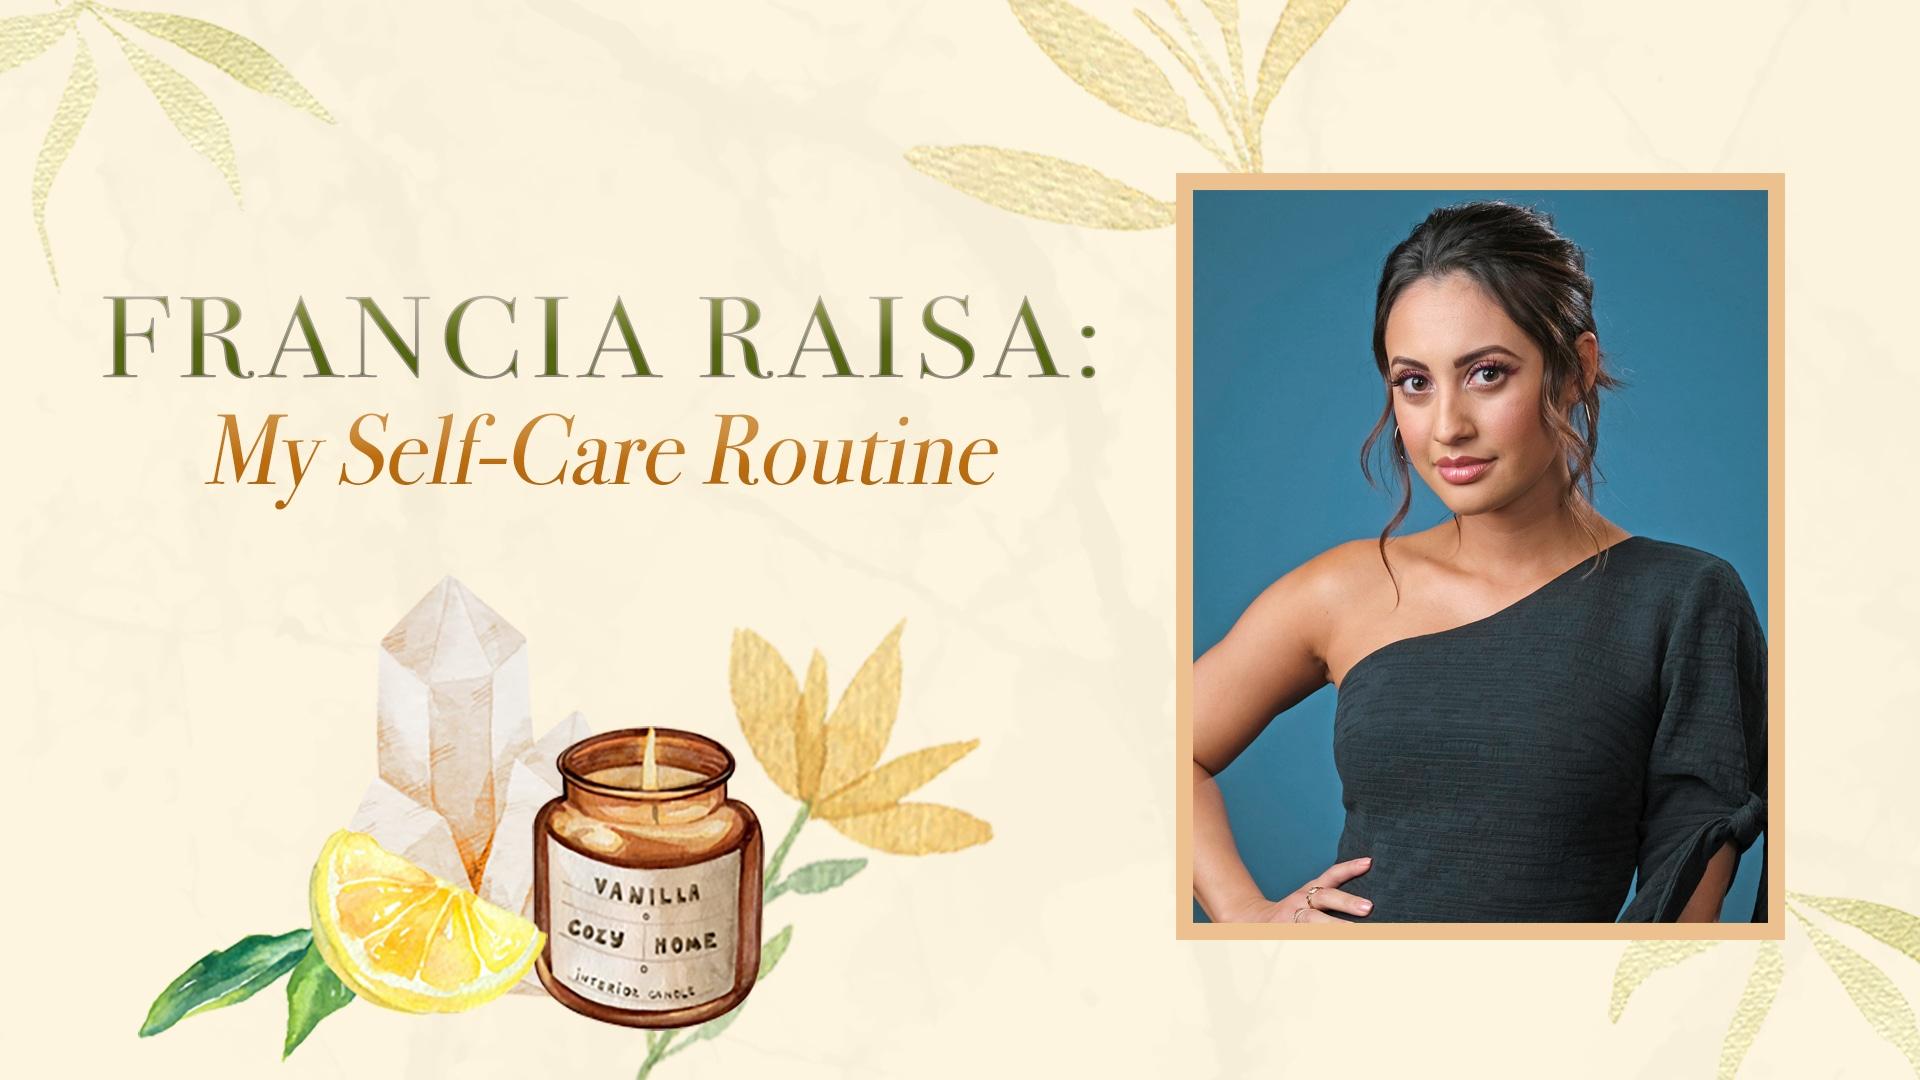 Francia Raisa: My Self-Care Routine, Wellness Wednesdays